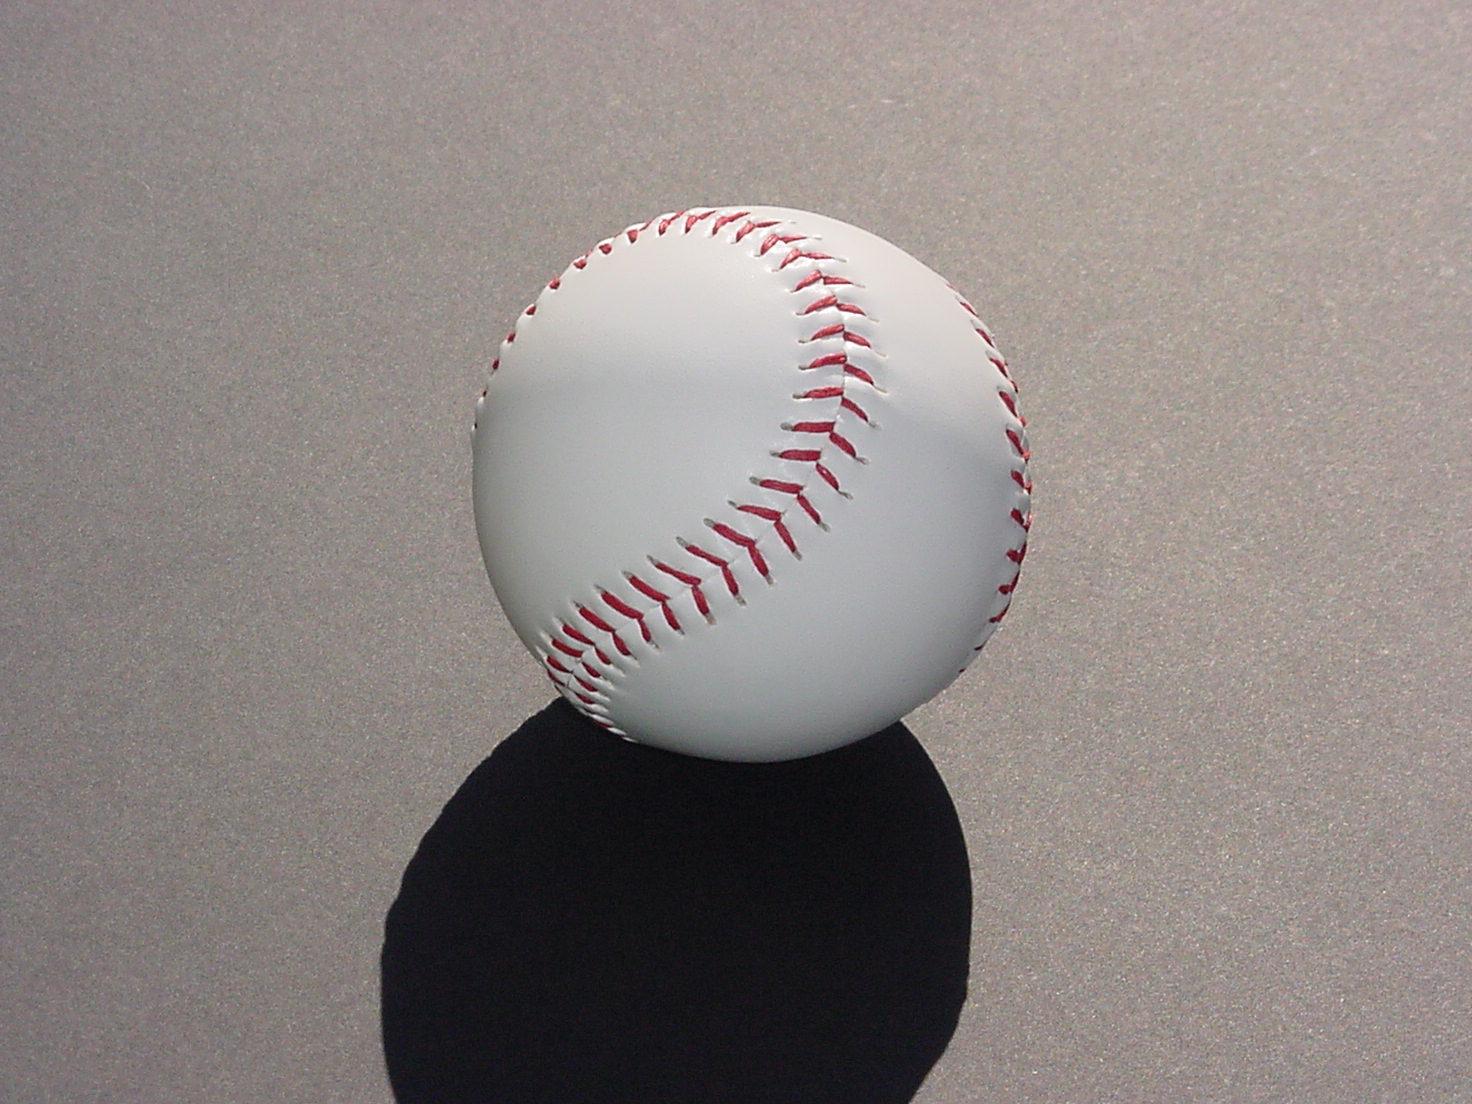 A softball sits on a parking lot